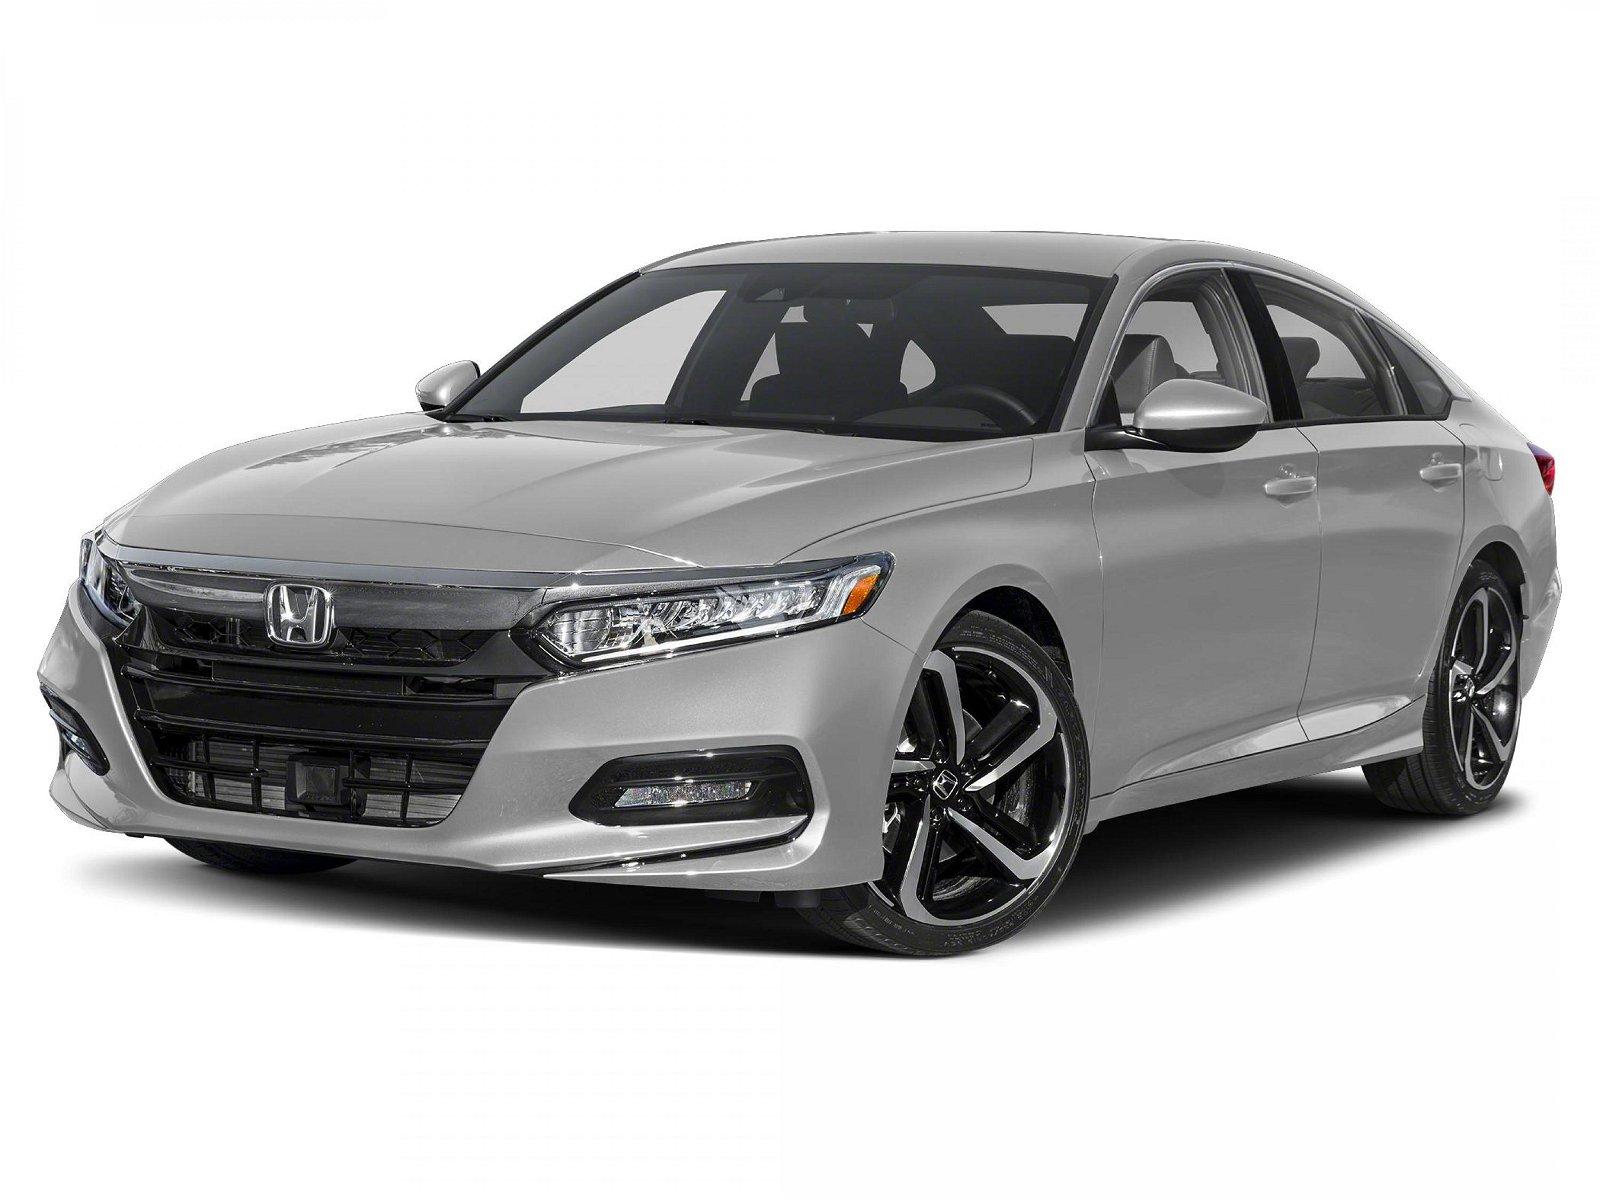 2020 Honda Accord Sport, stock no. H20673 - Birchwood ...